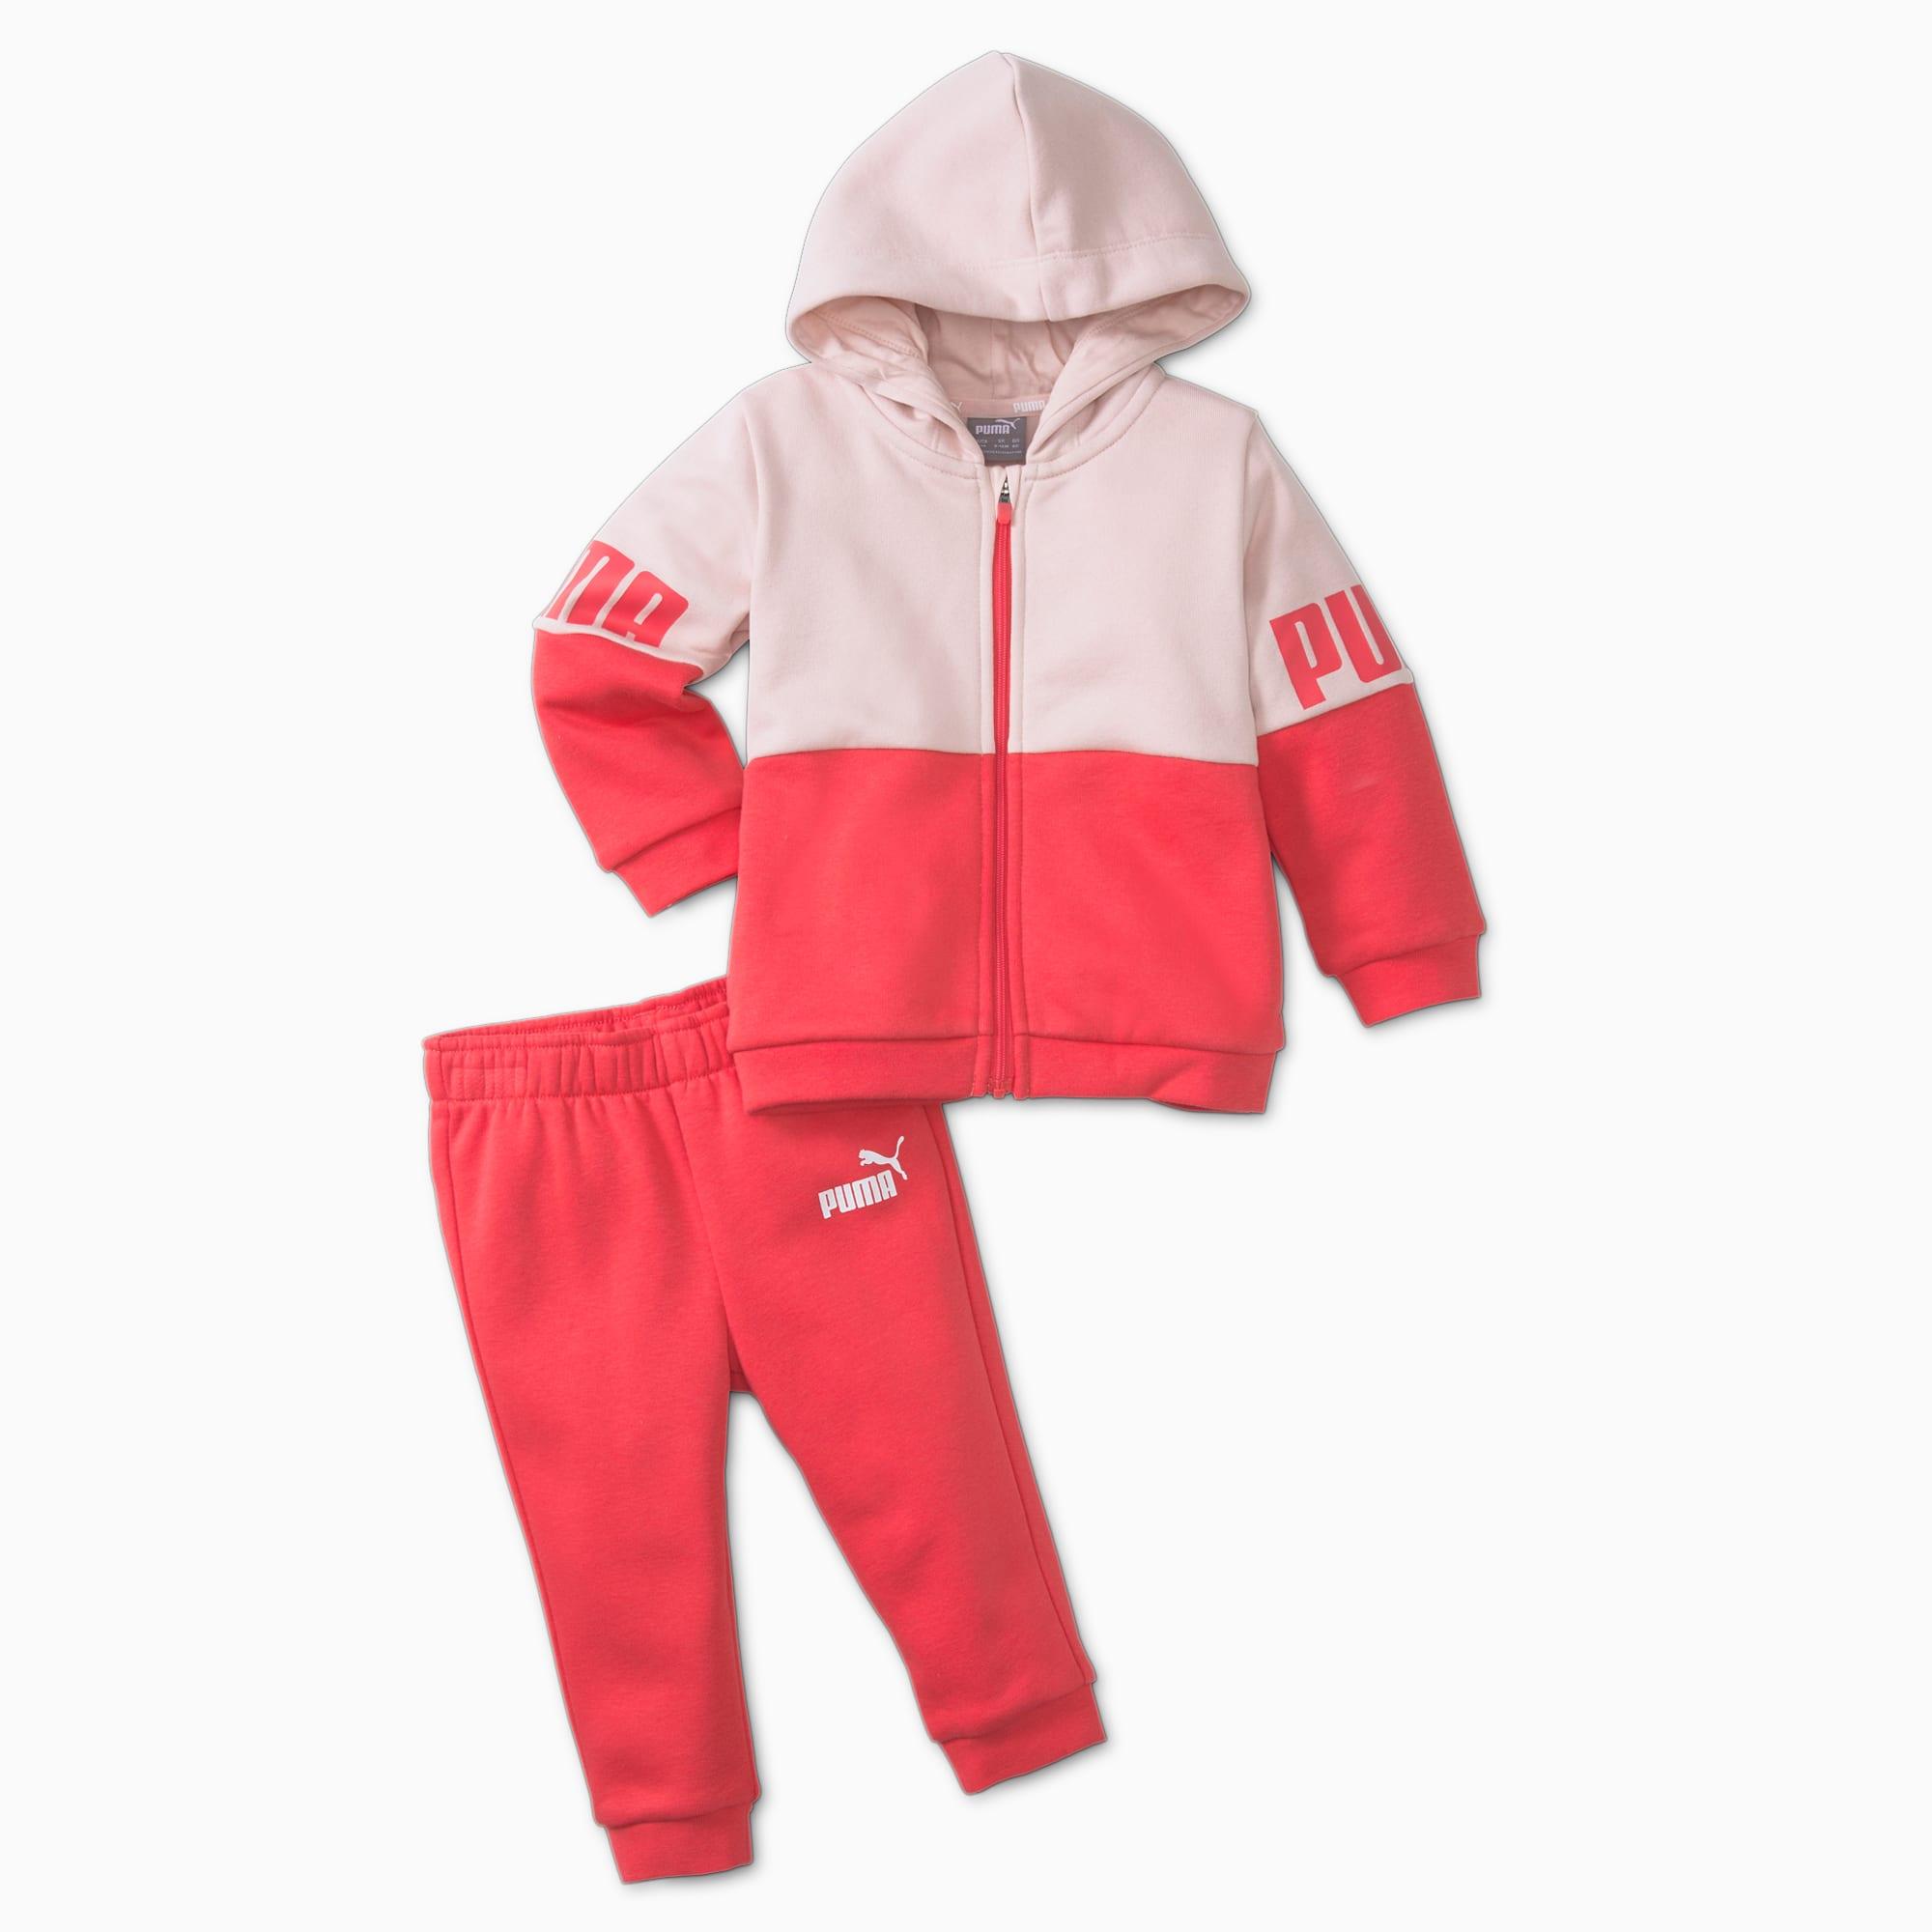 PUMA Minicats Power Babies' Jogger Set, Paradise Pink, size 2T, Clothing